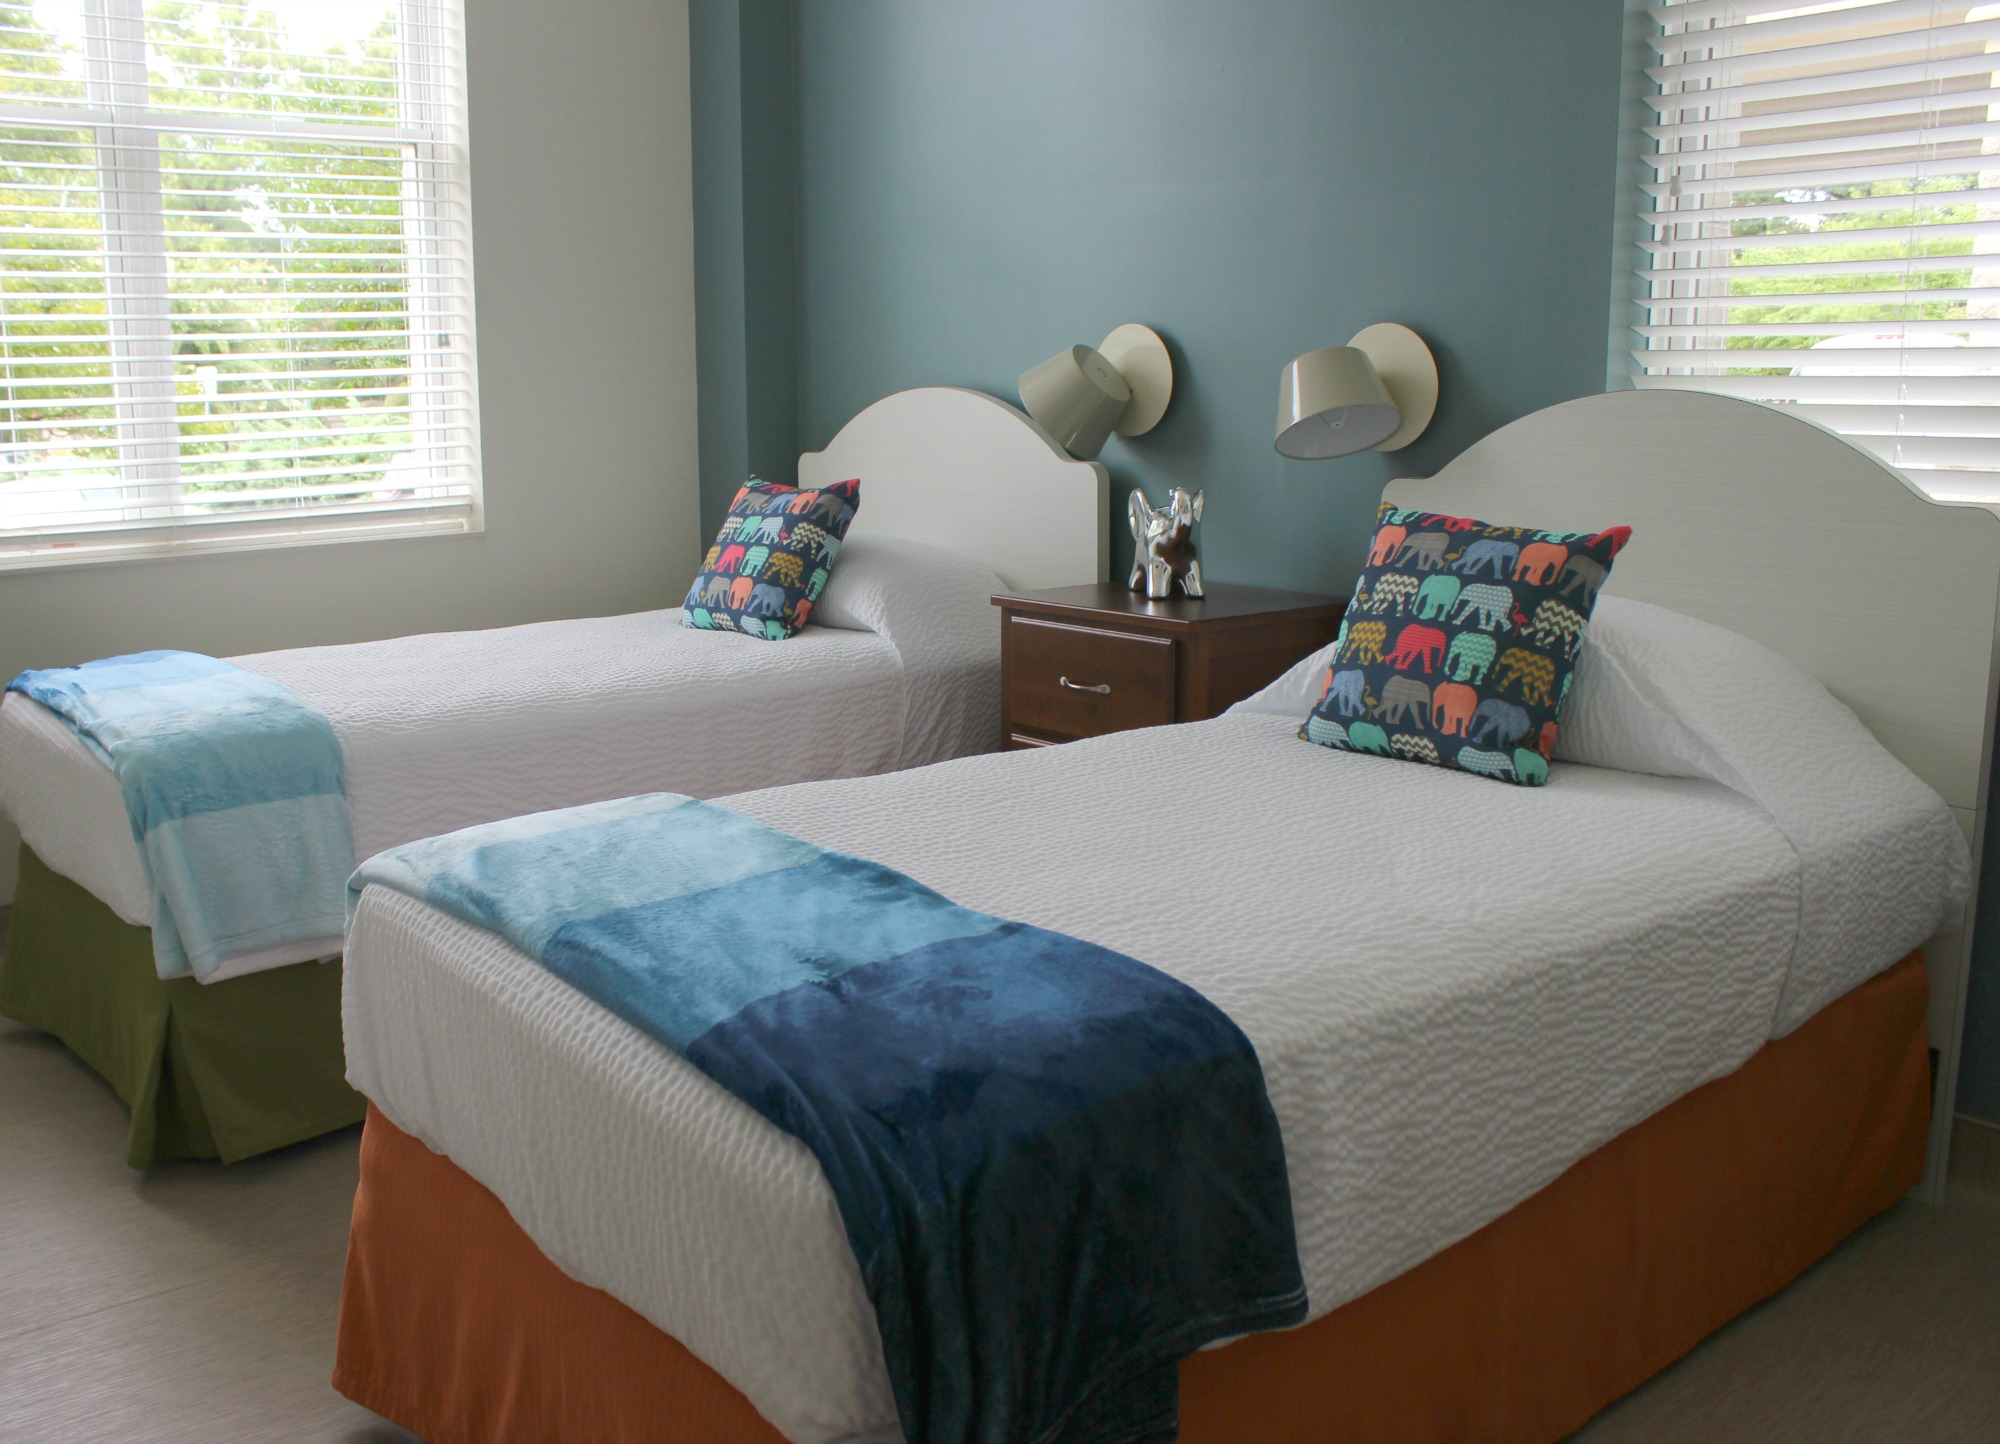 Target House bedroom